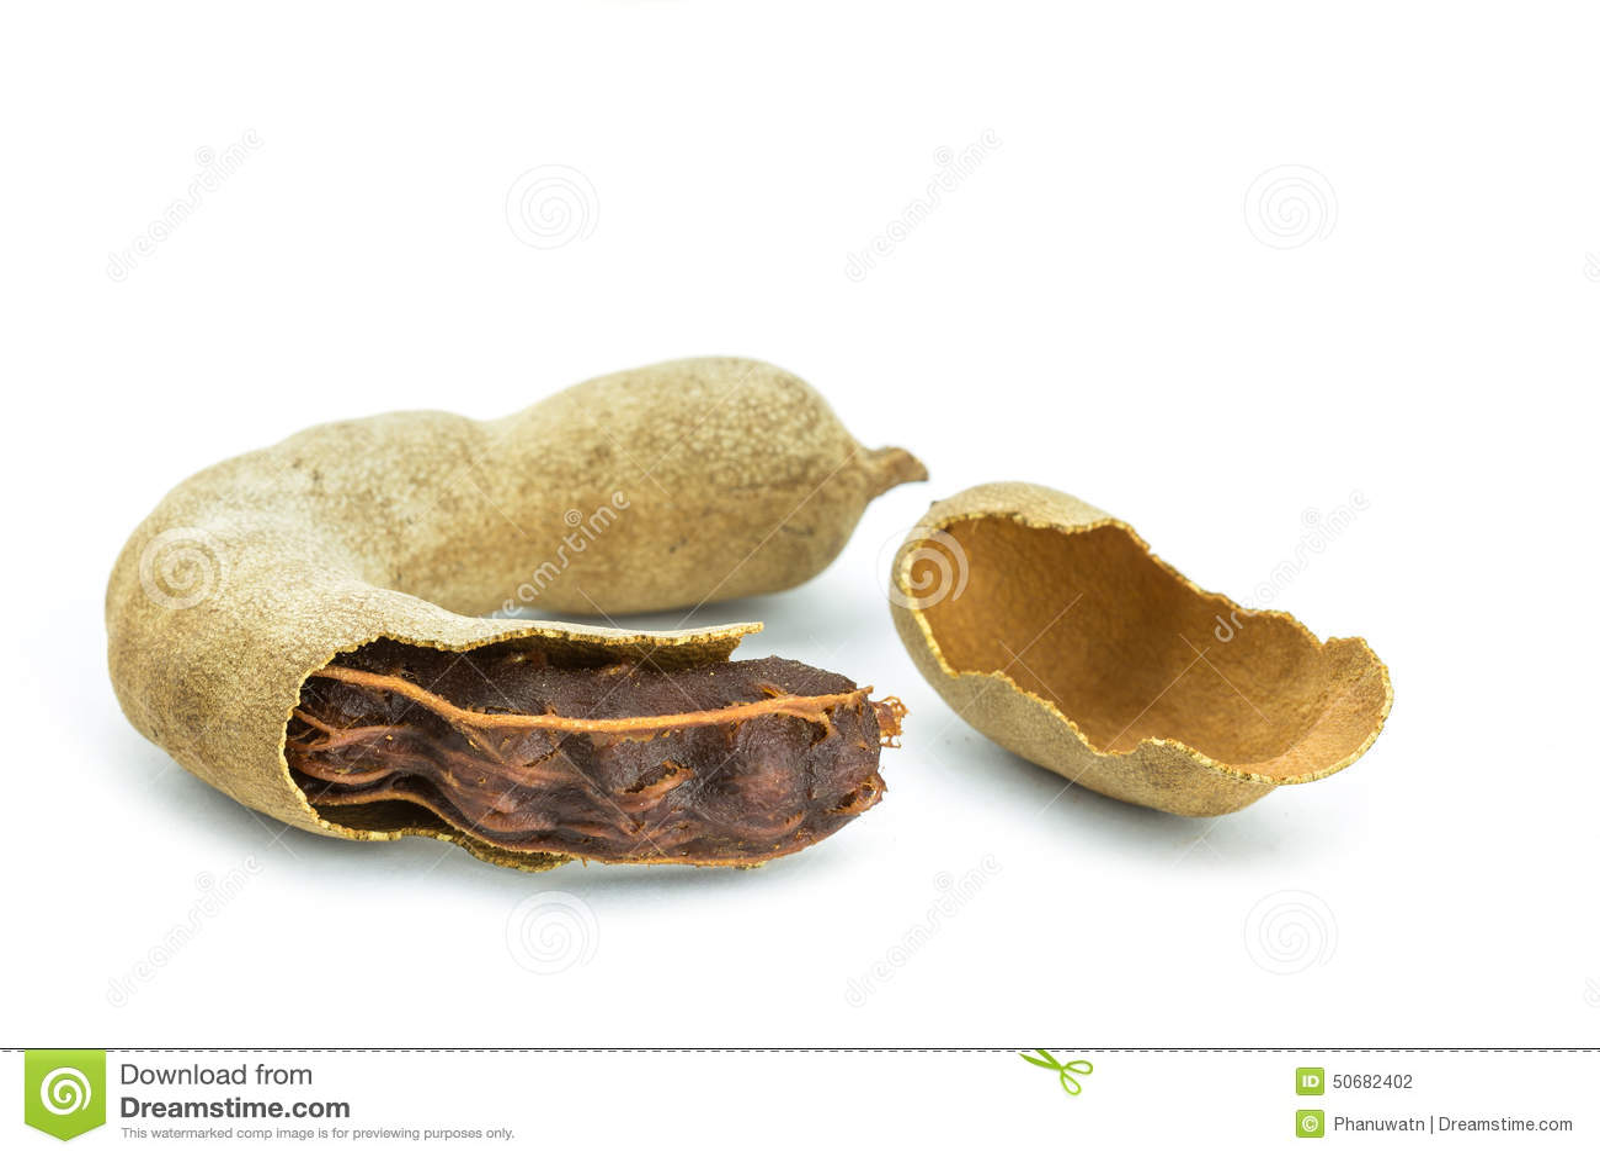 Download 关闭在白色背景的罗望子树 库存照片. 图片 包括有 黏浆状物质, 异乎寻常, 健康, 背包, 查出, 泰国 - 50682402